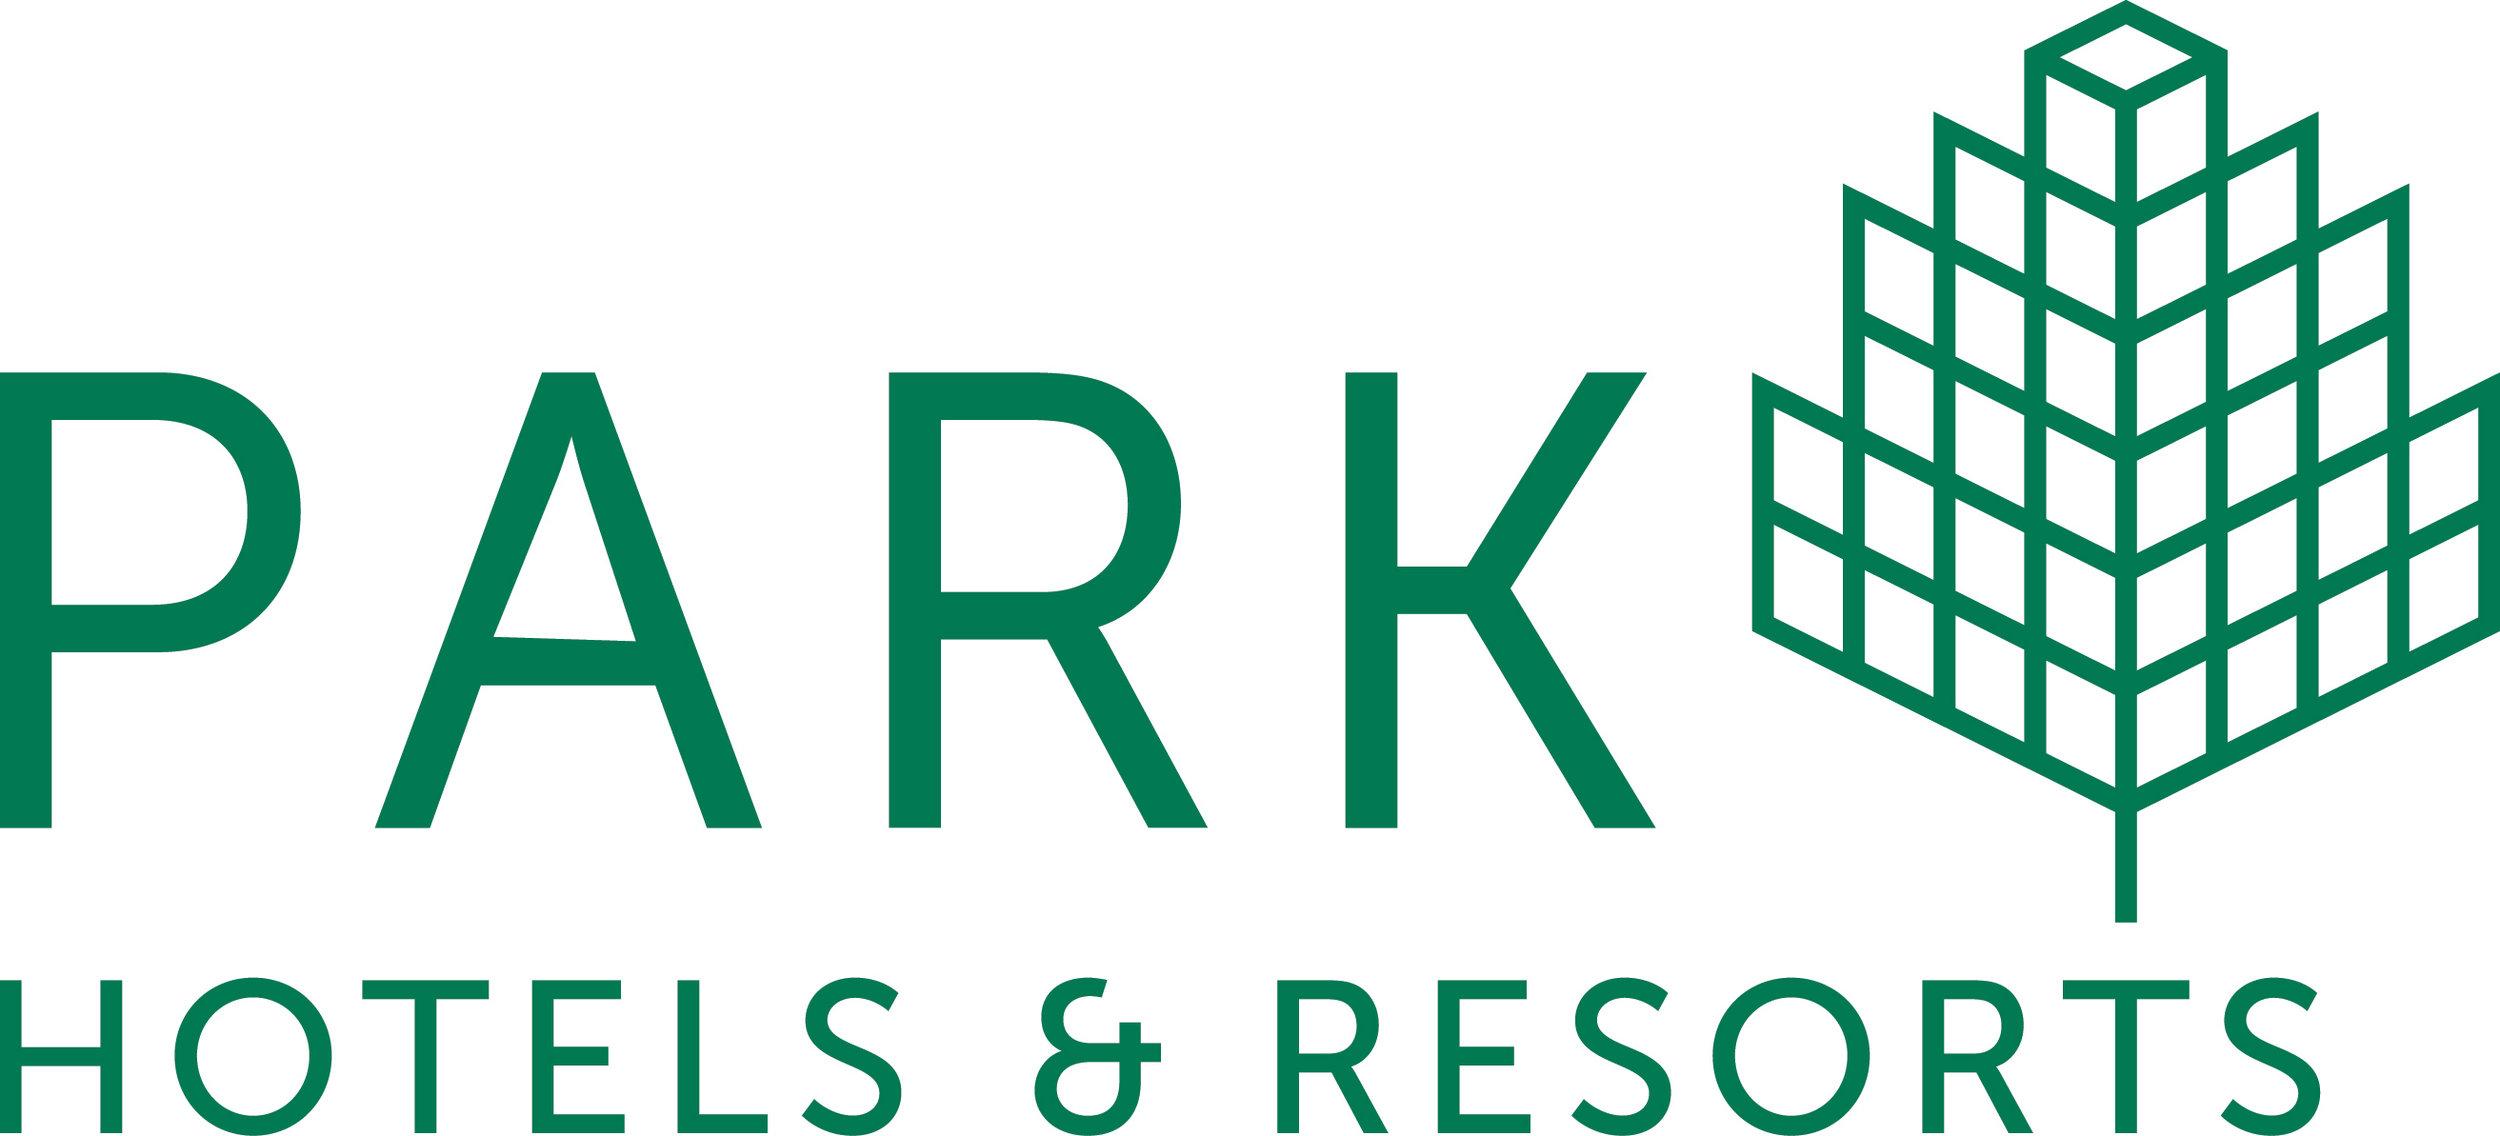 Park Hotels and resorts.jpg